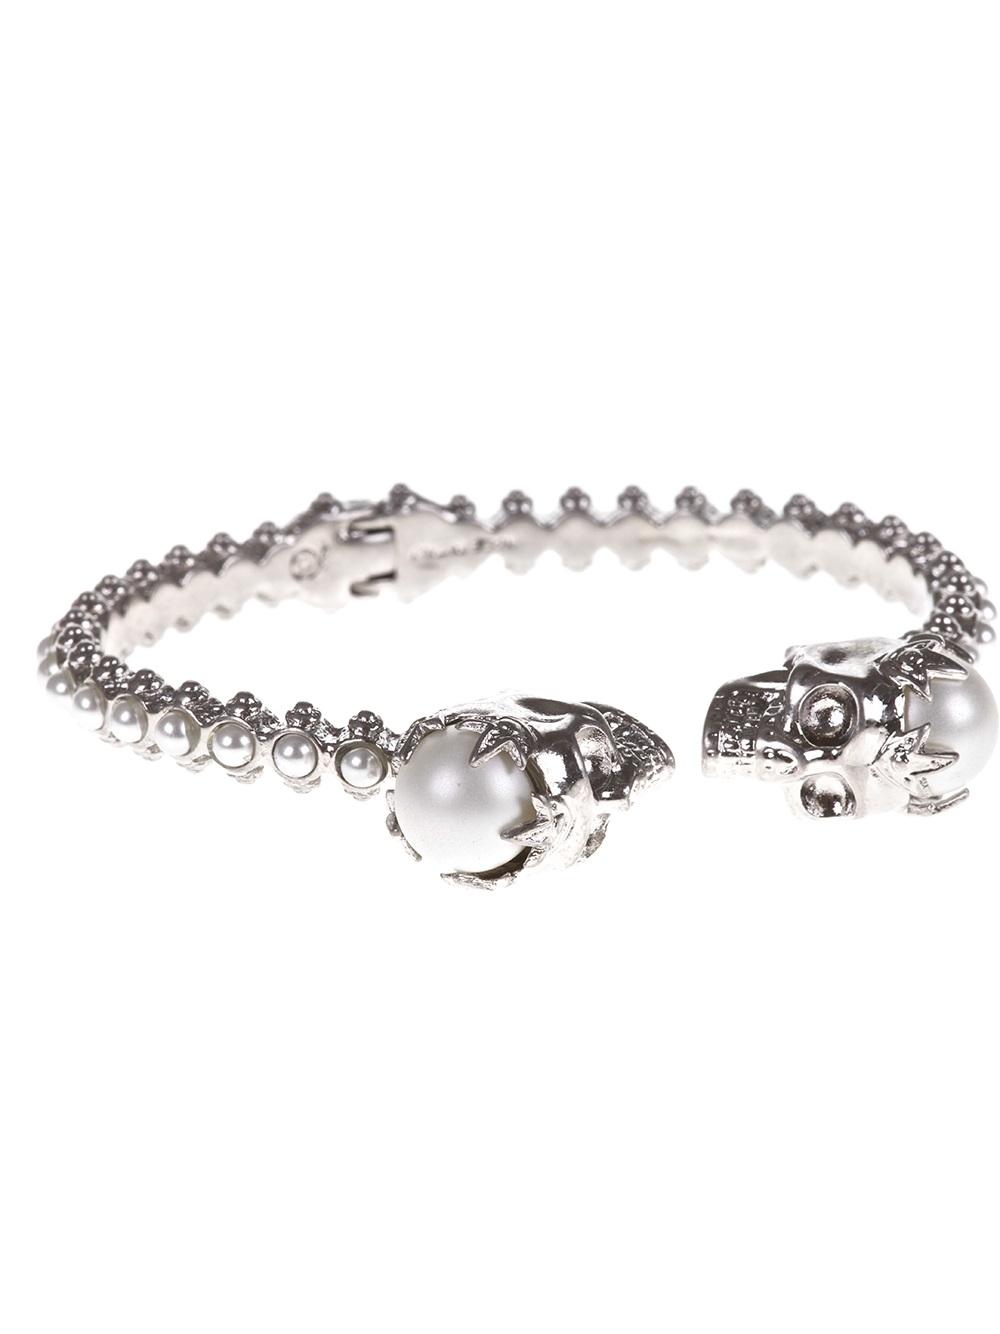 JEWELLERY - Bracelets Alexander McQueen Xh2zaJqWO